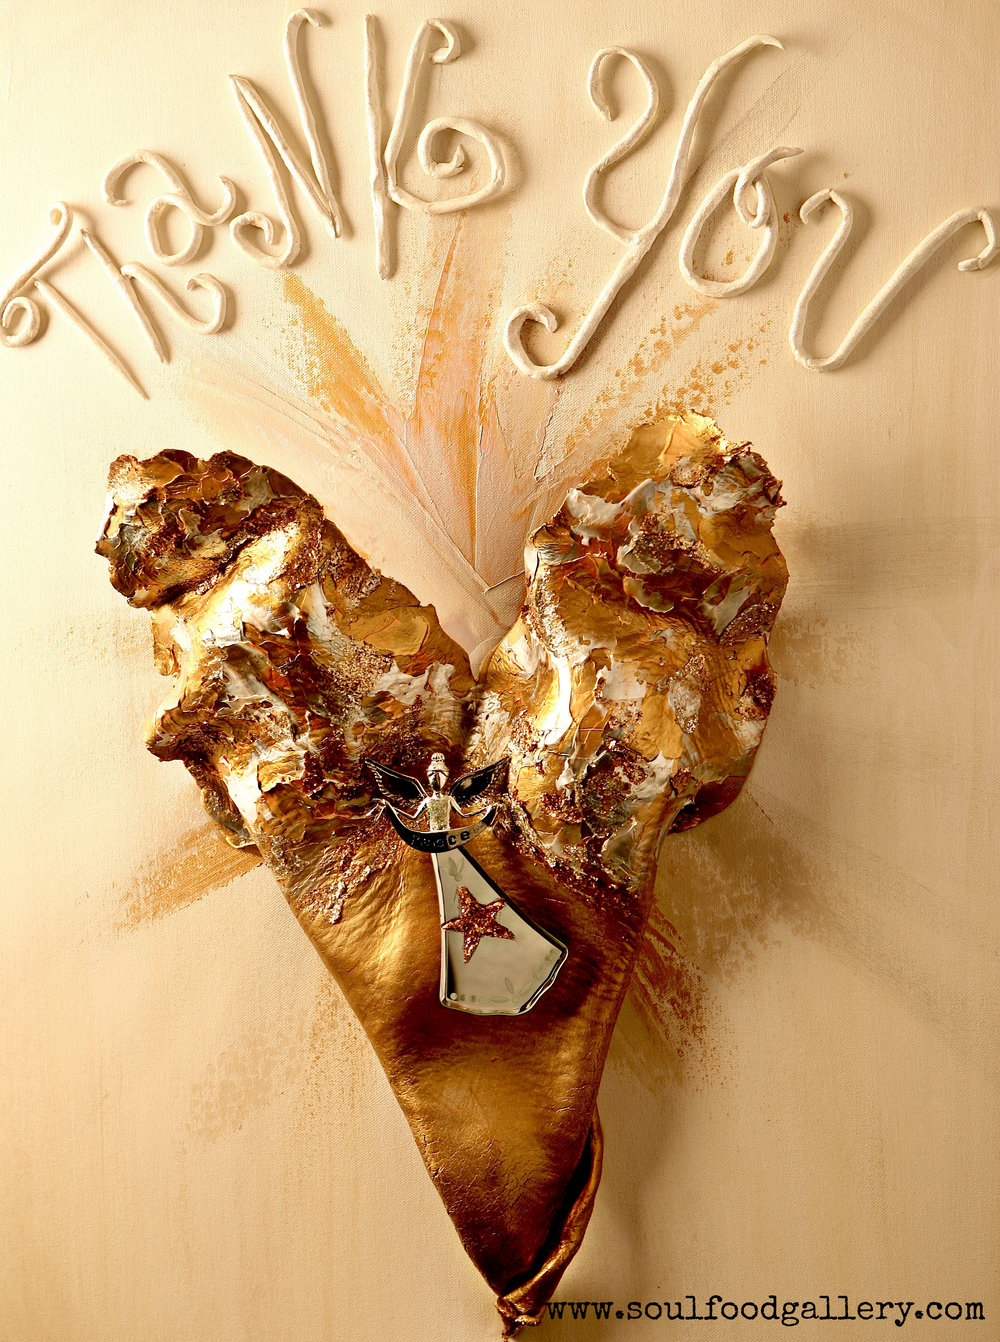 #14 - Gratitude